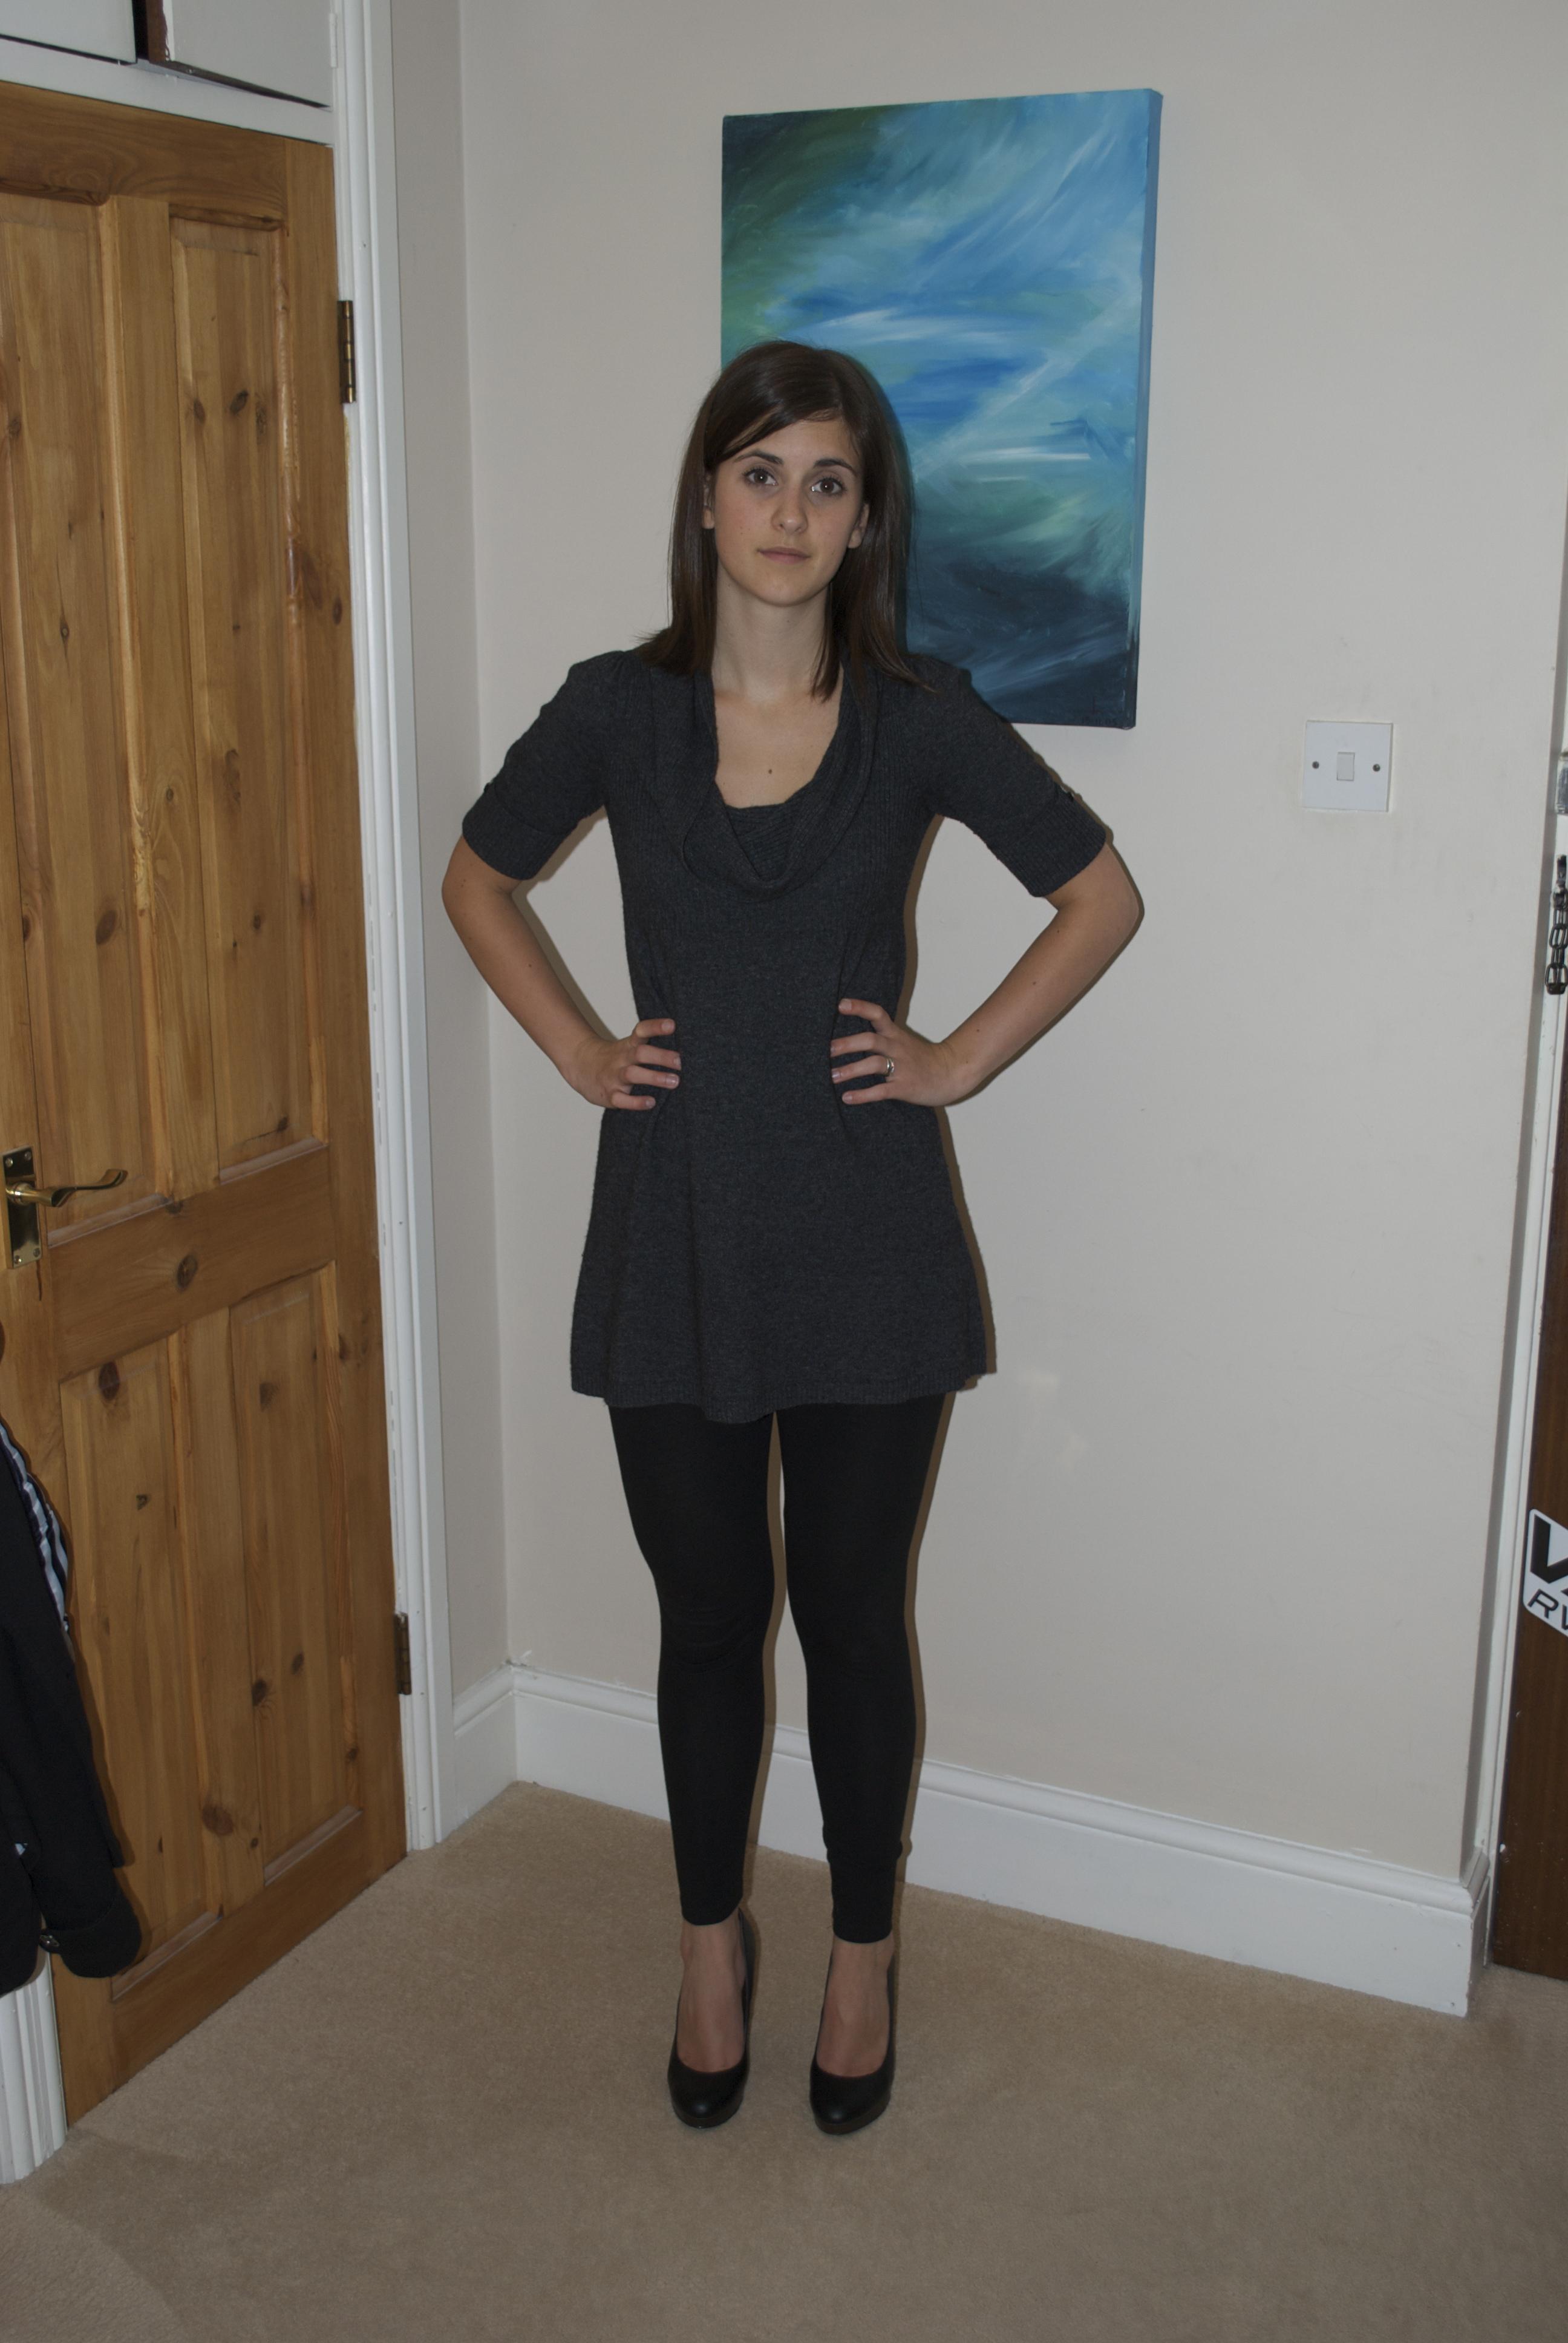 Party Dress Leggings